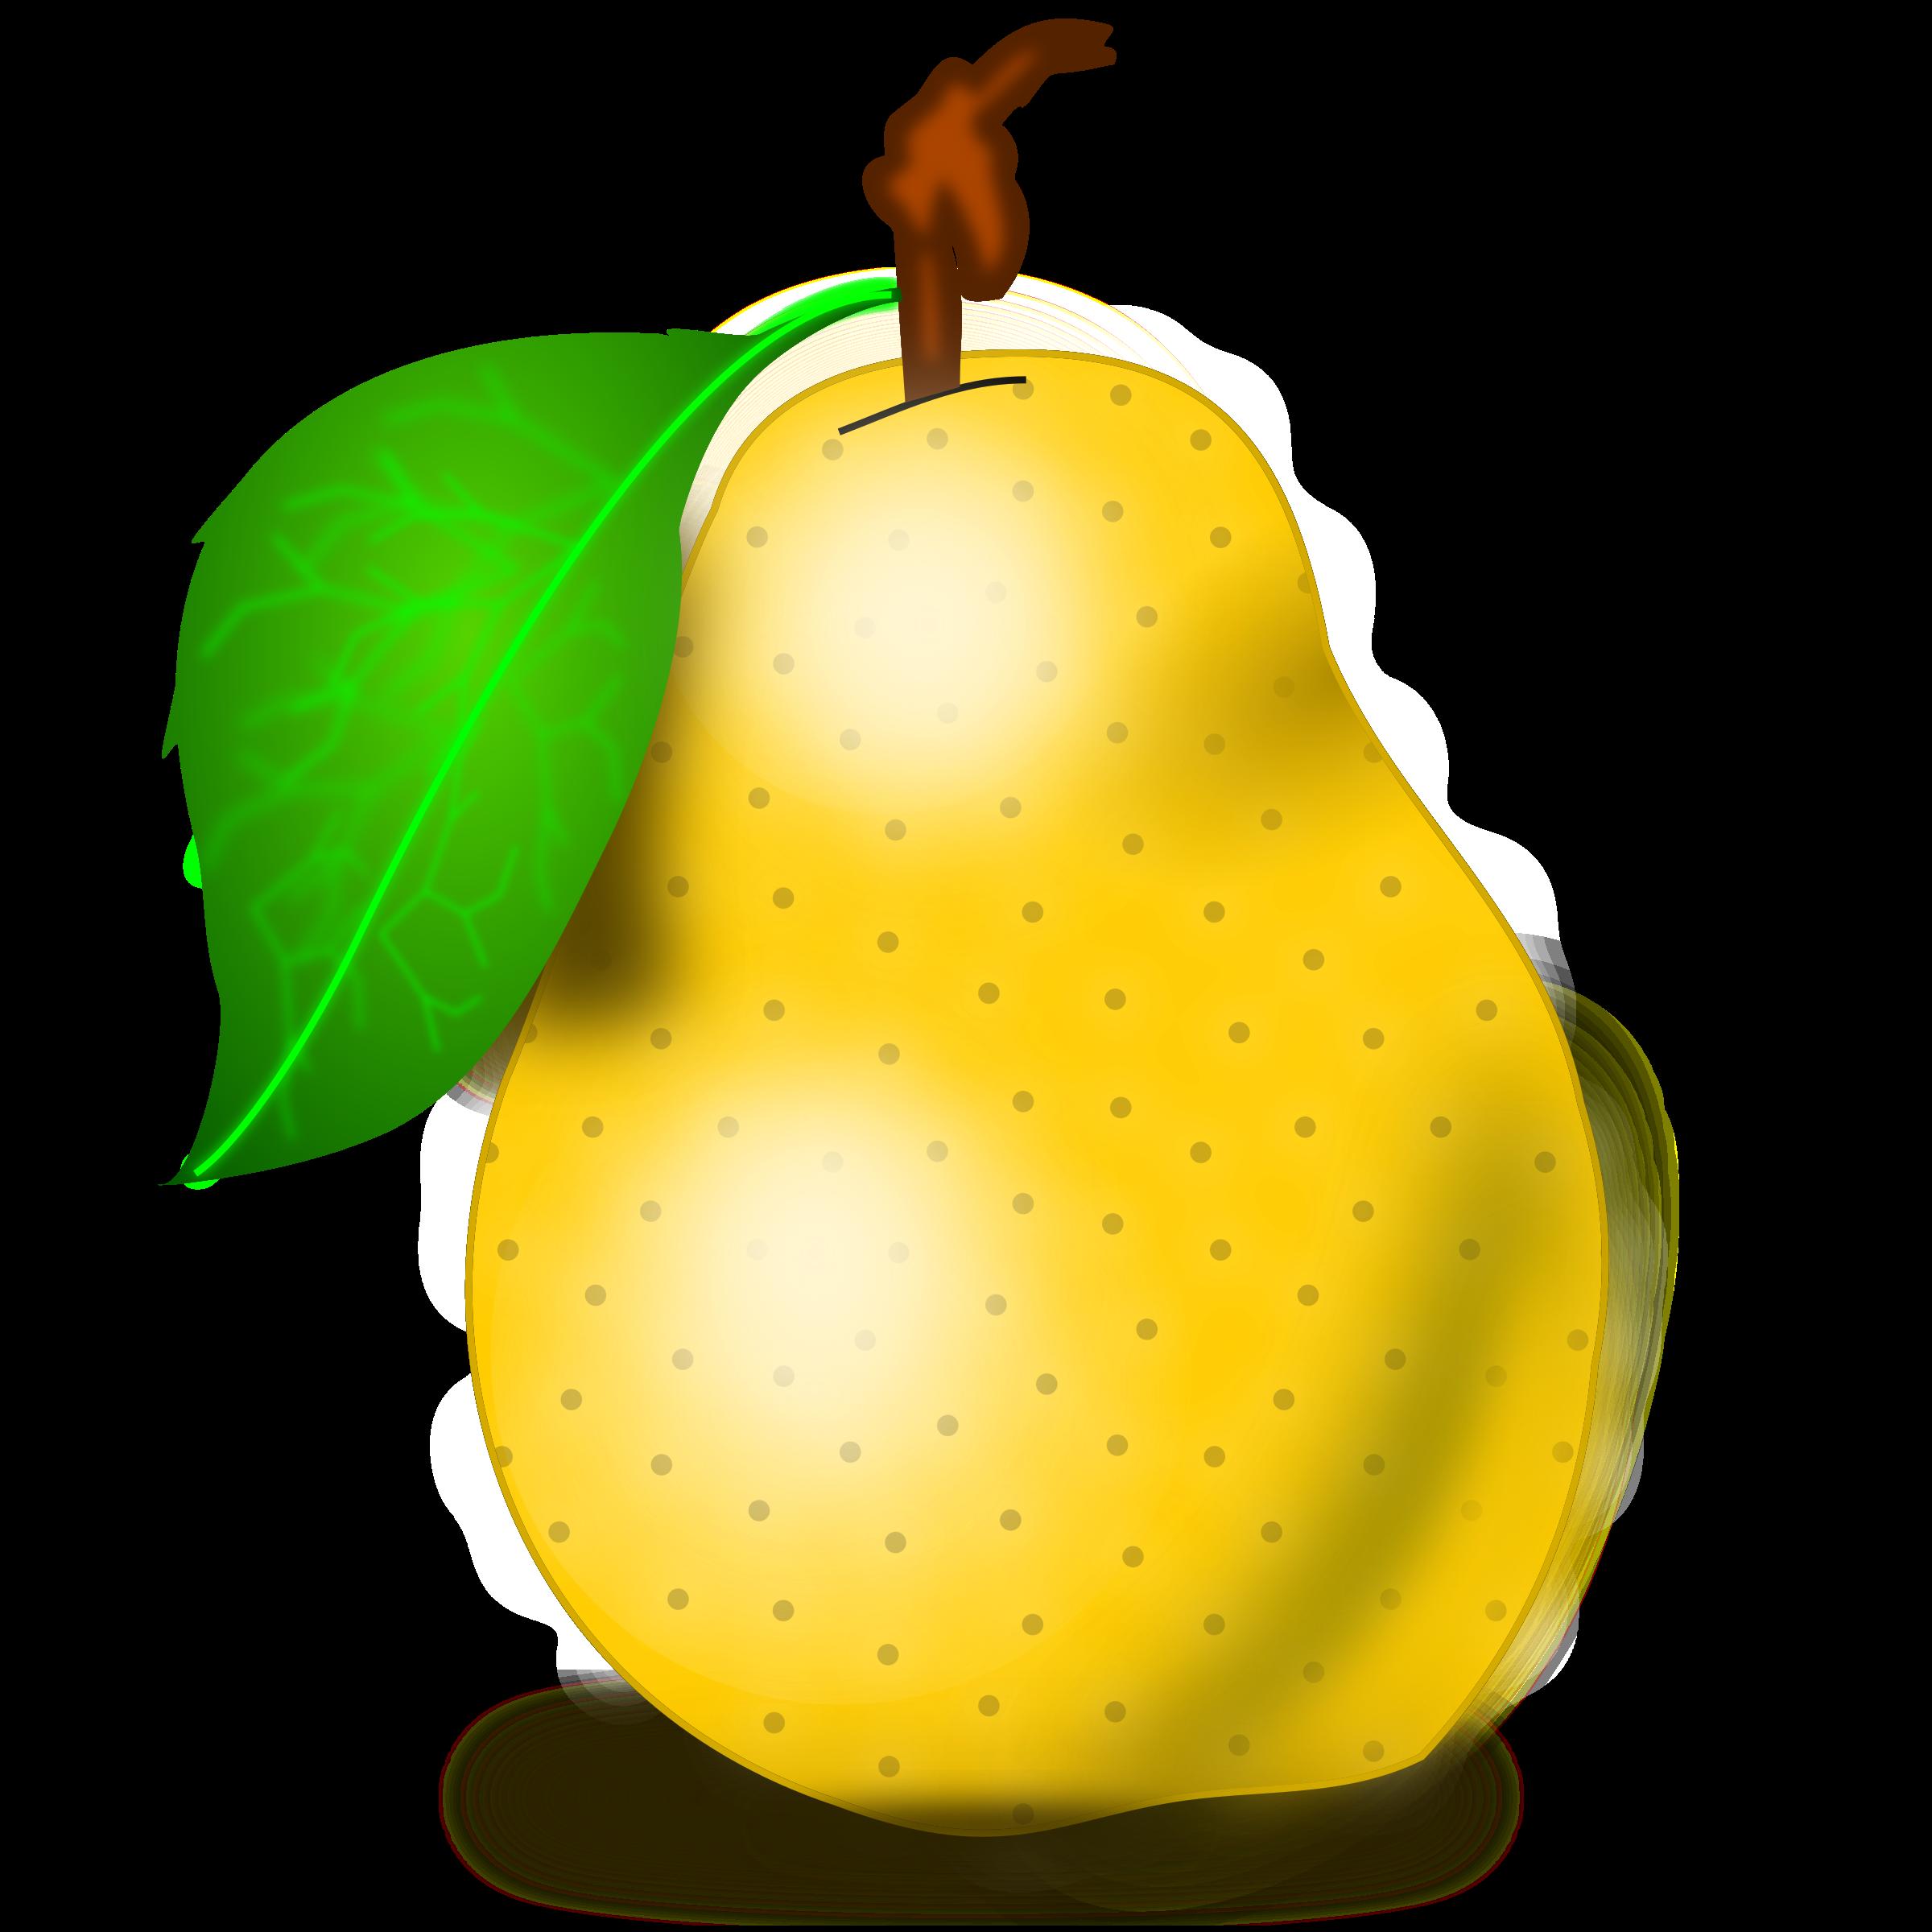 783 Pear free clipart.